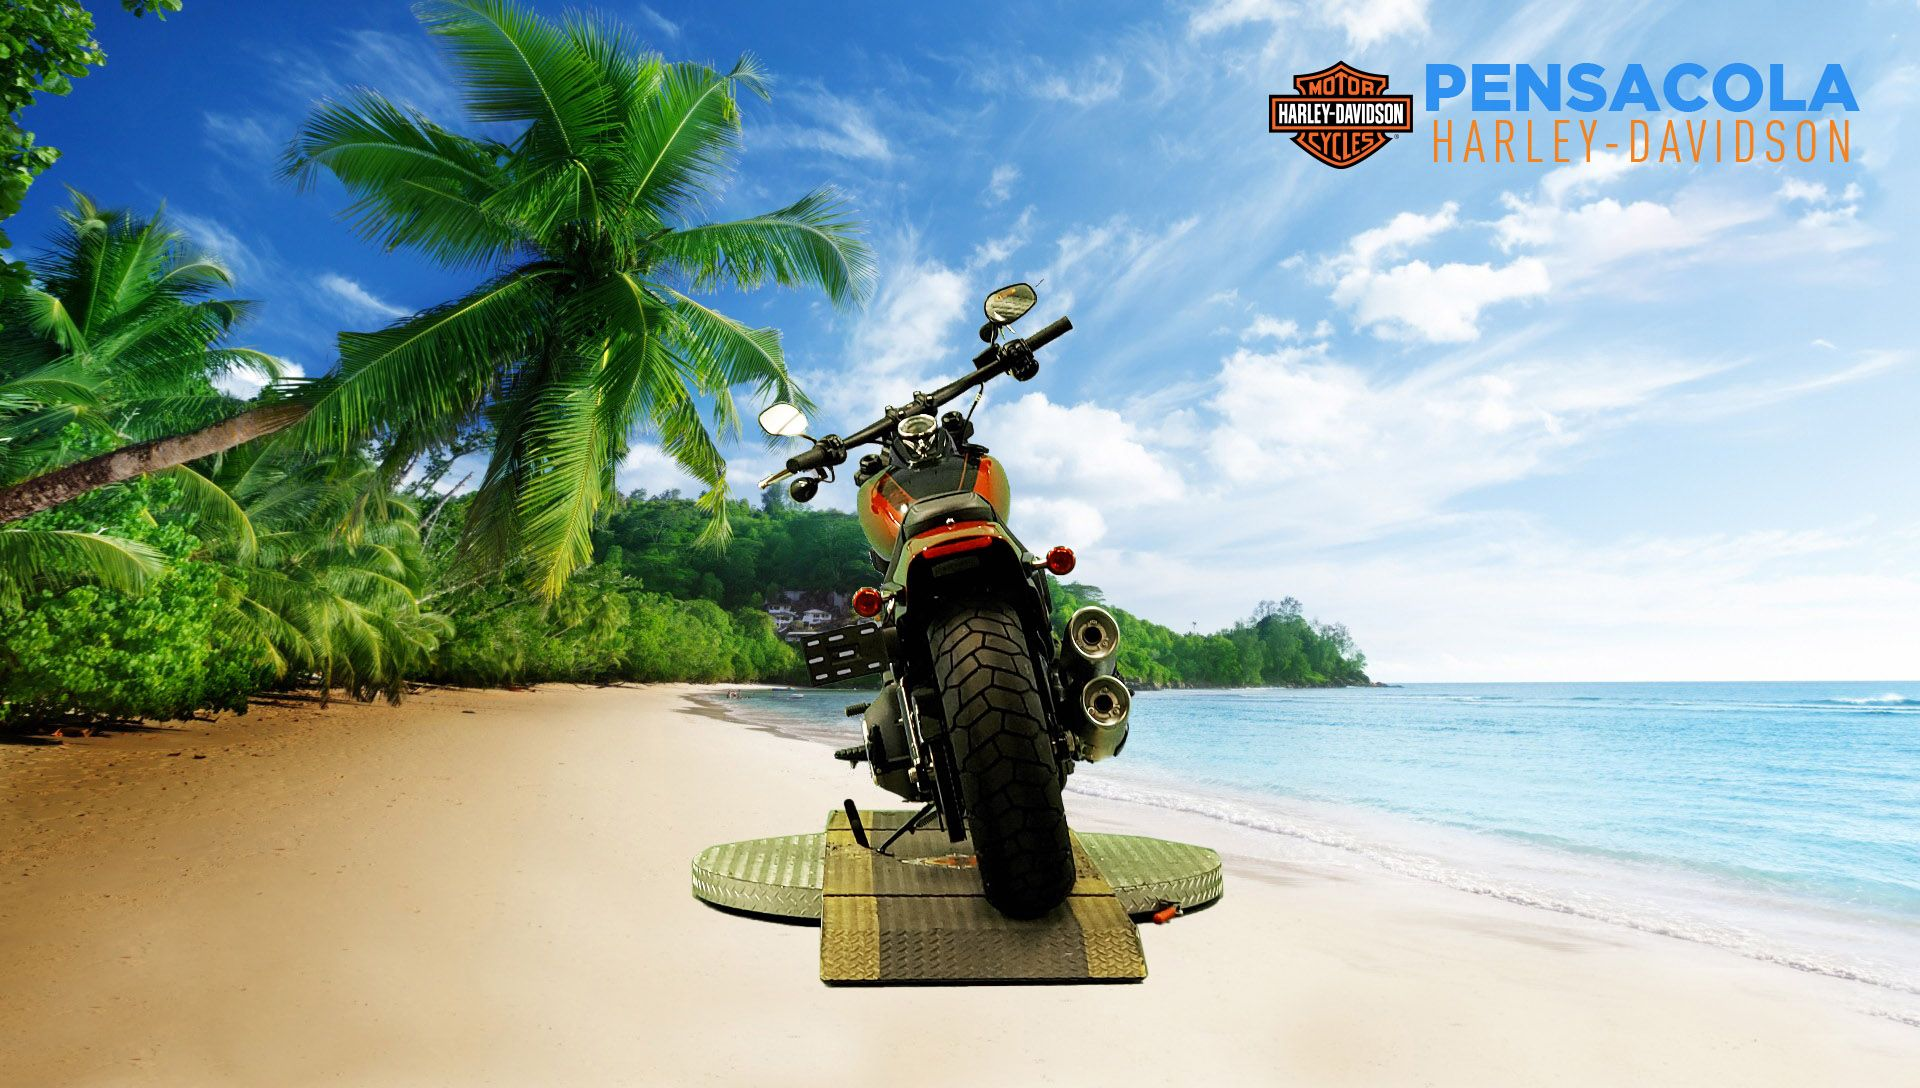 New 2021 Harley-Davidson Fat Bob 114 FXFBS